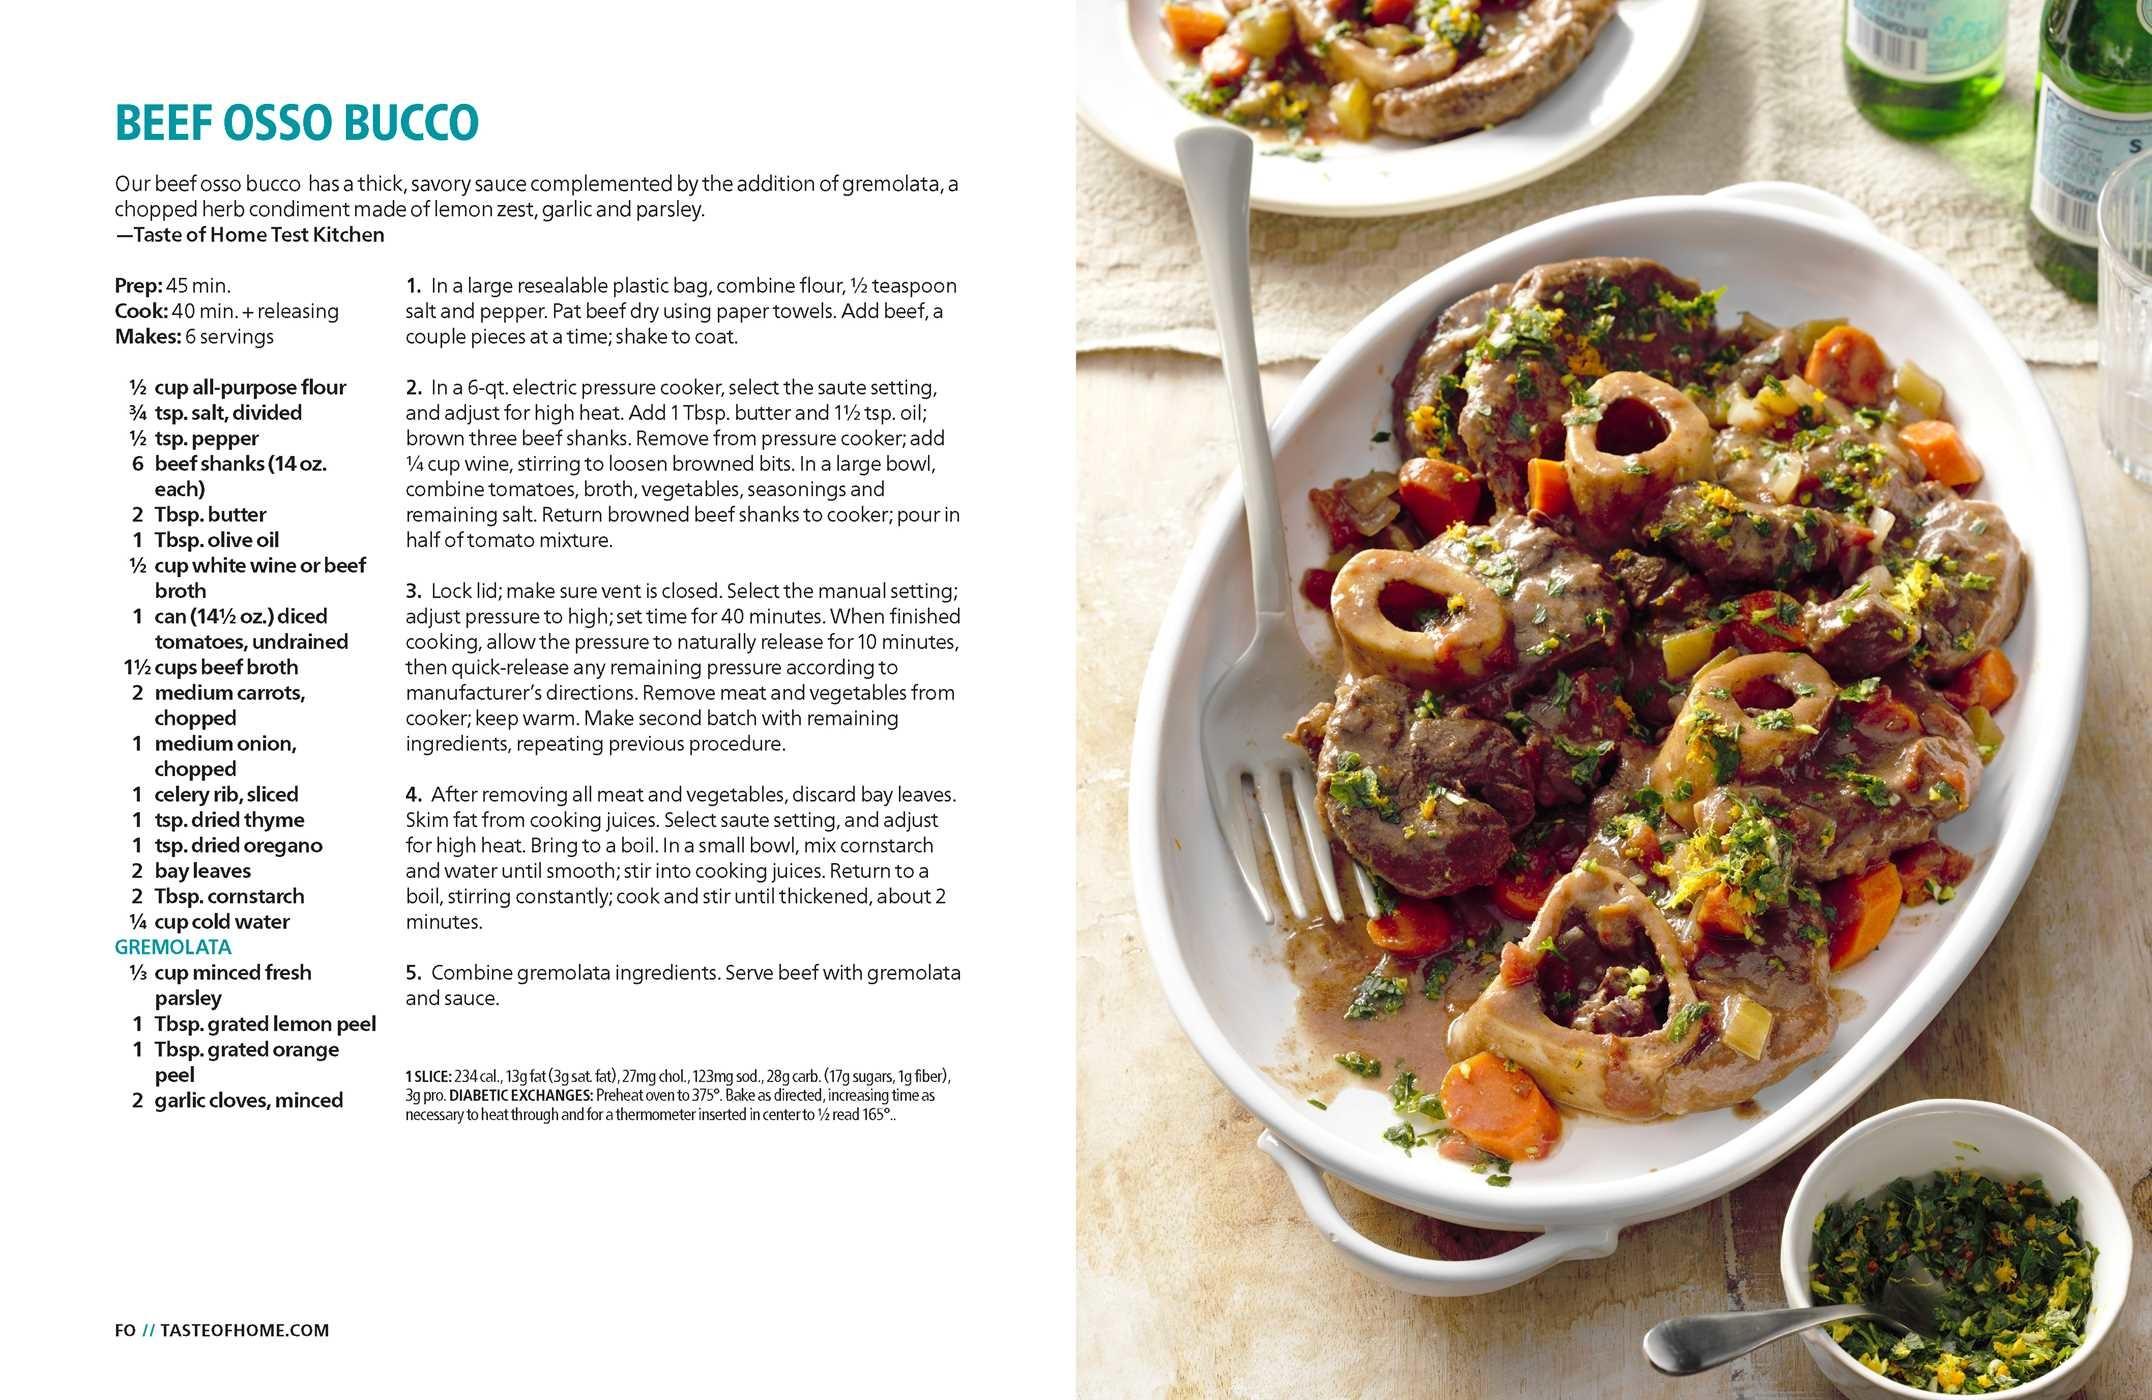 Taste of home instant pot cookbook 9781617657665.in05